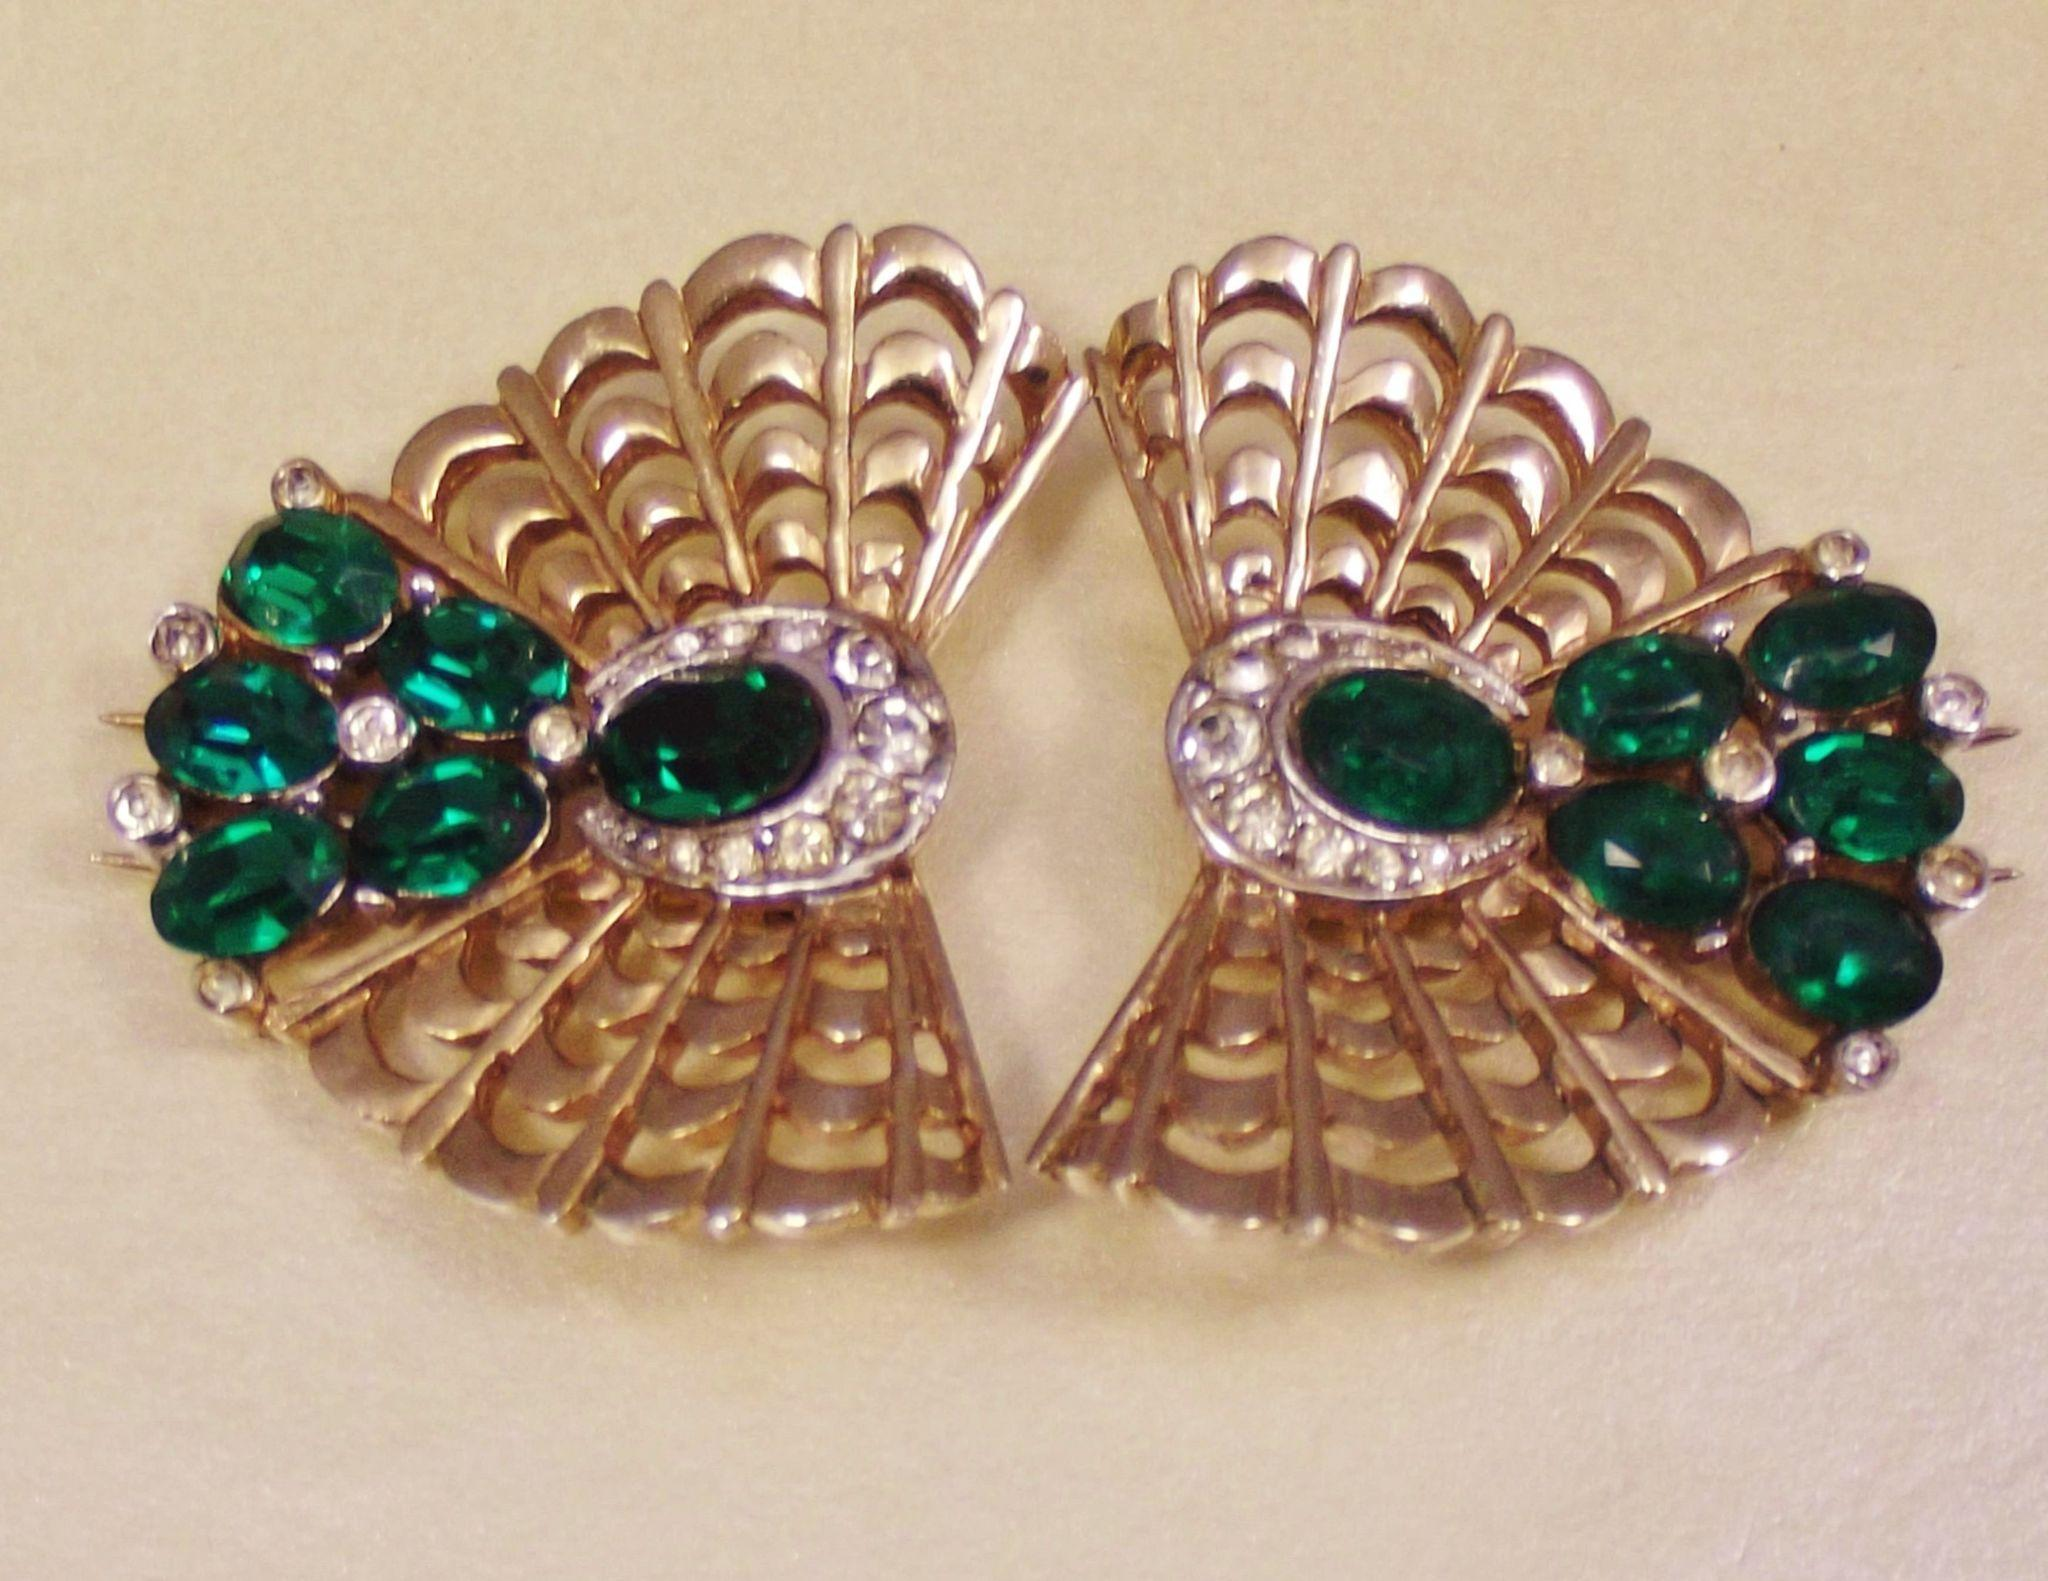 marcel boucher emerald rhinestone fur pins from